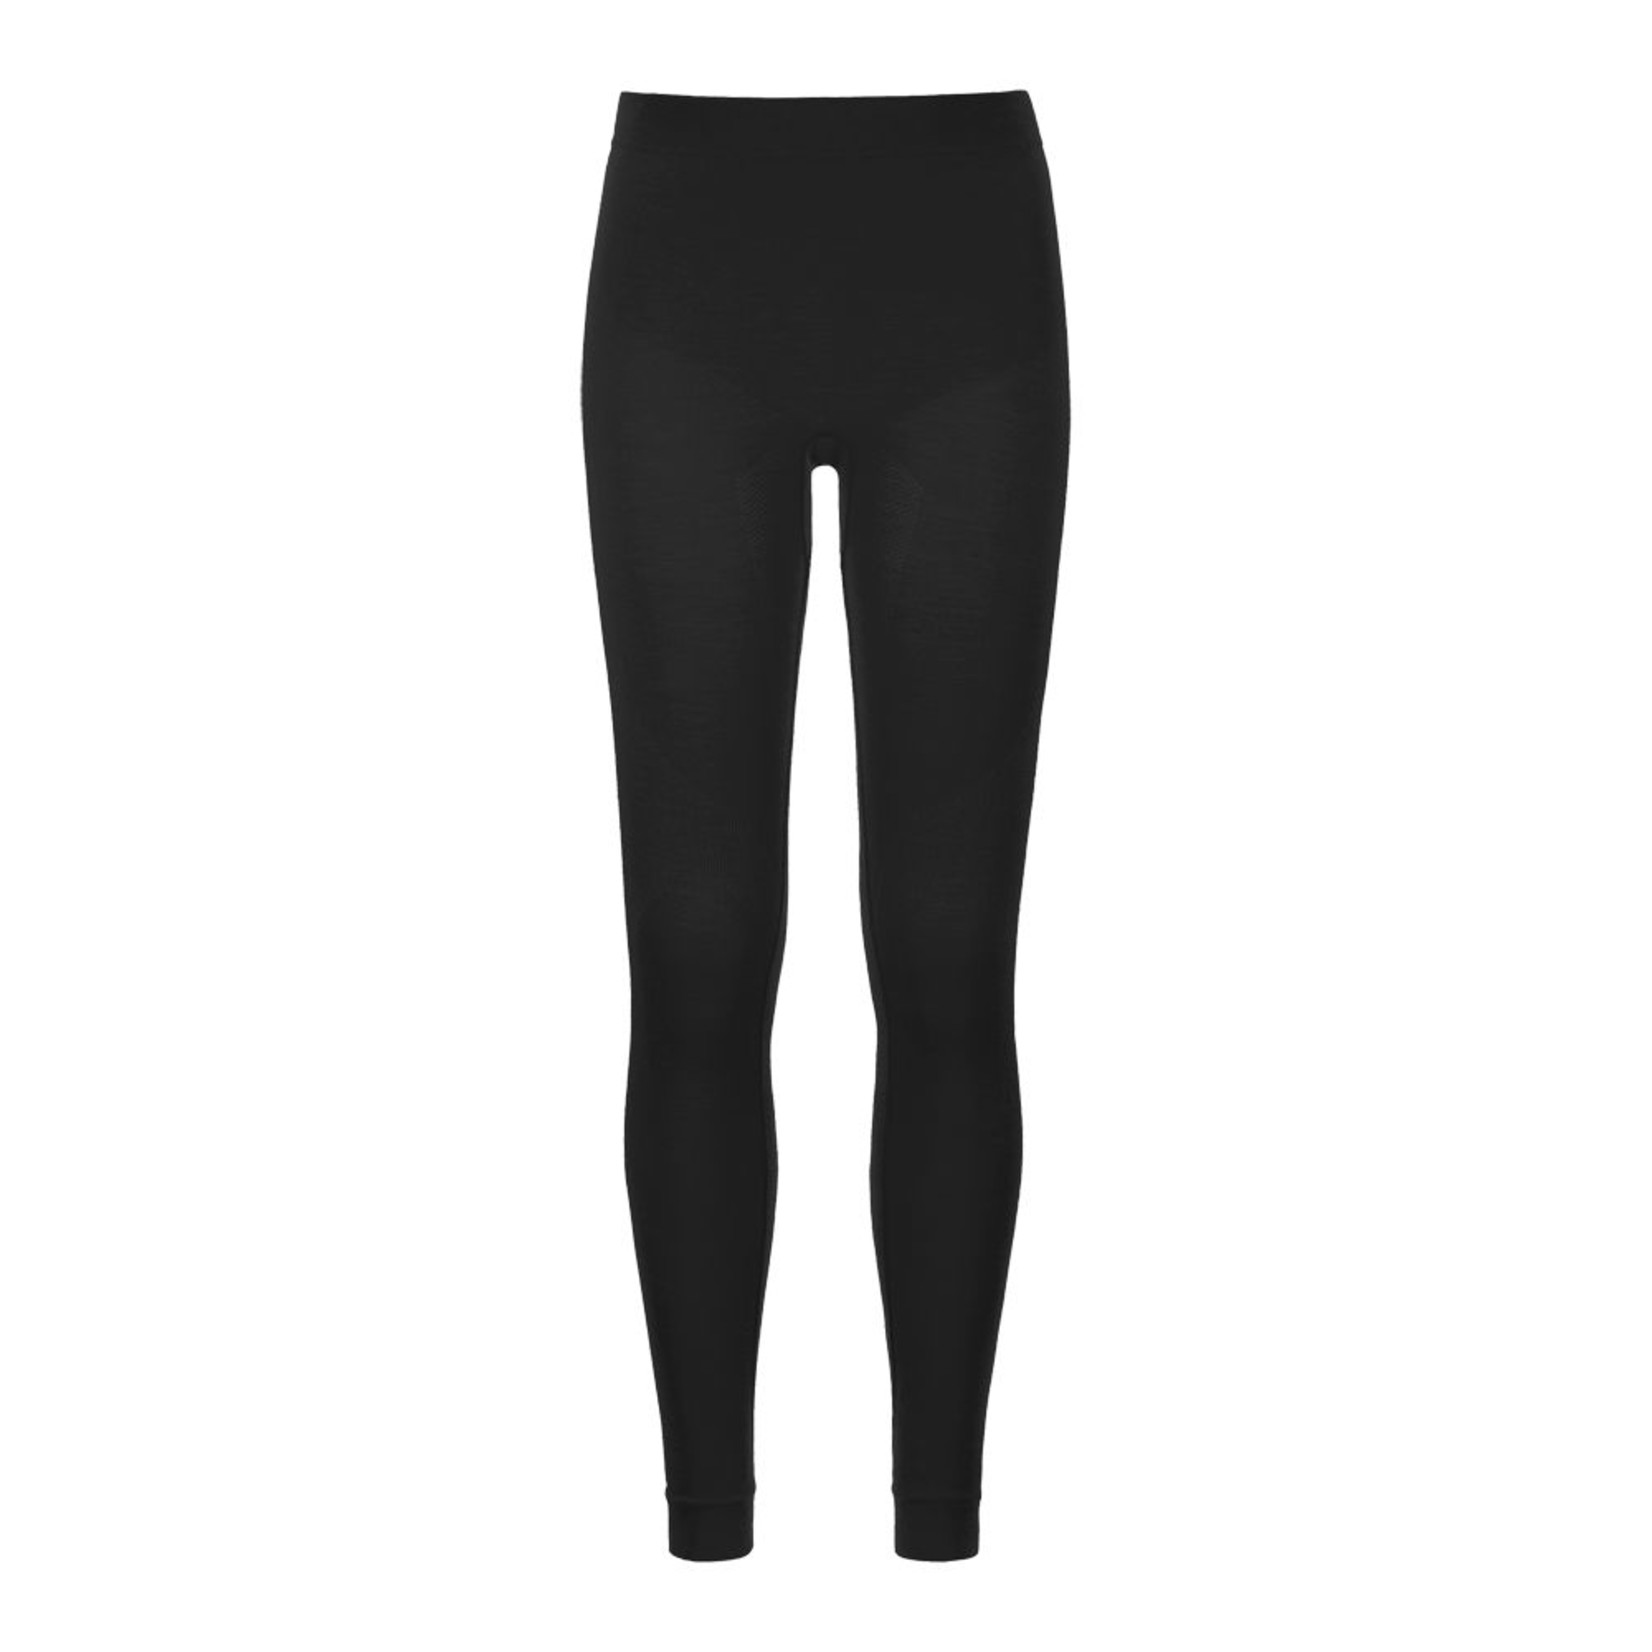 Ortovox Ortovox 230 Merino Long Pants - Women